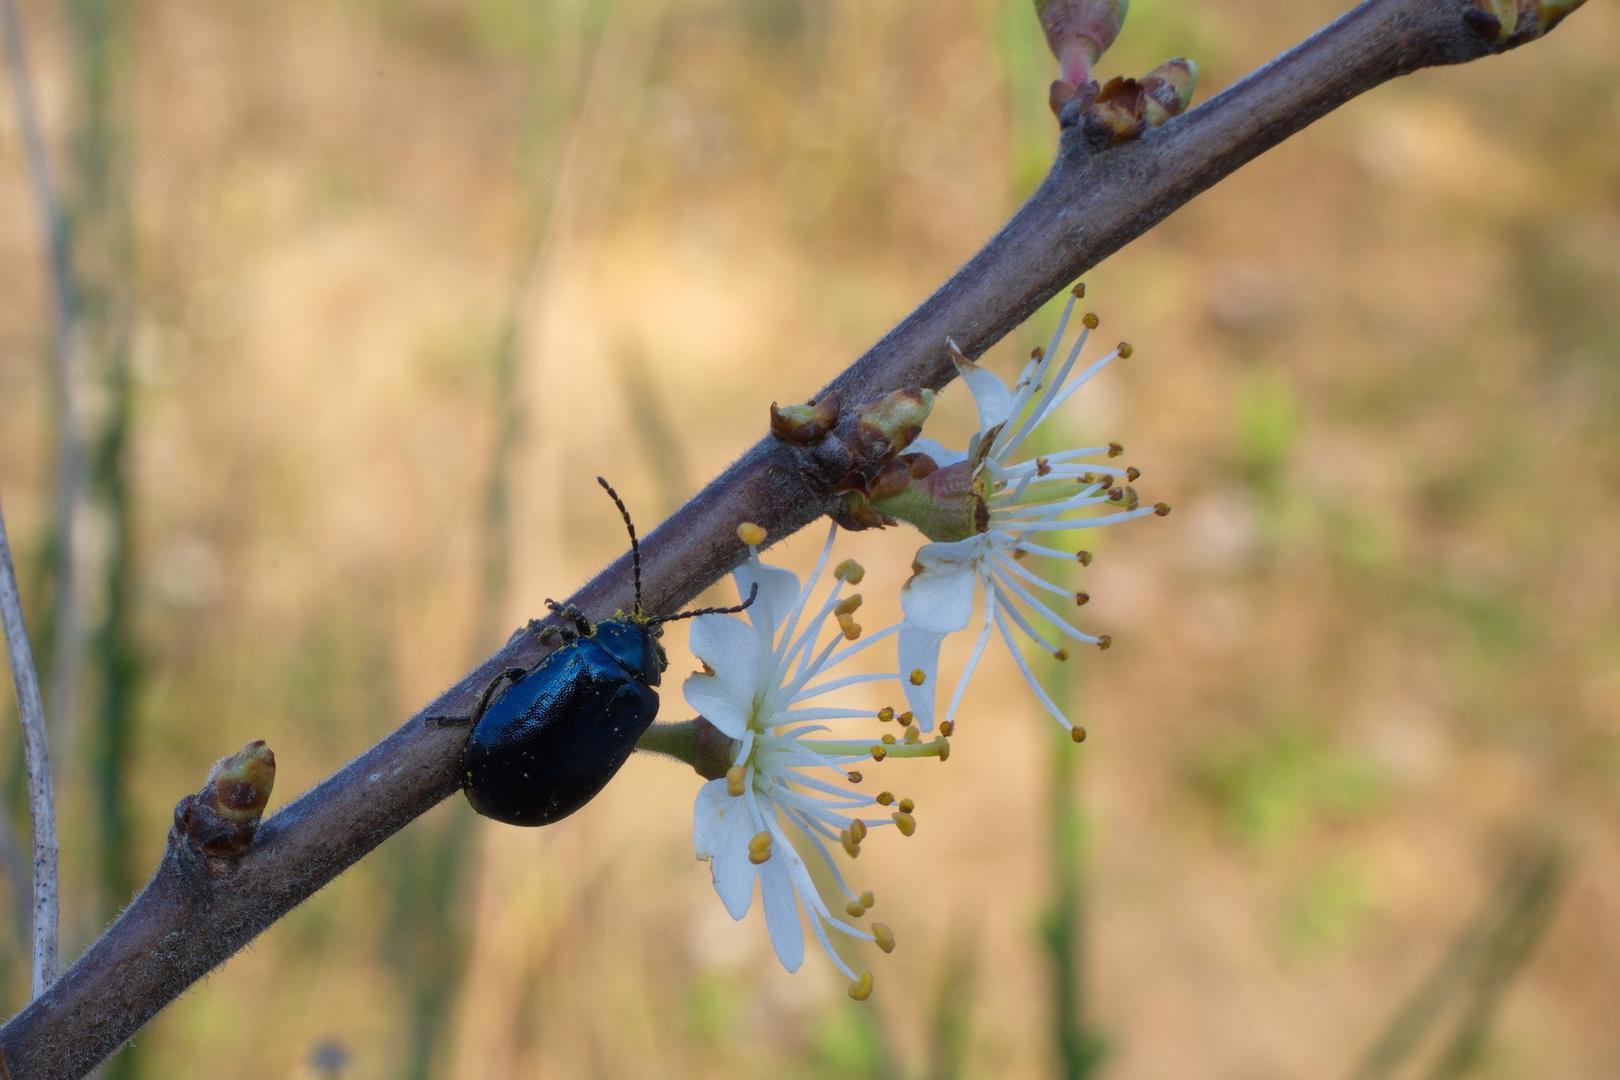 Blauer Erlenblattkäfer